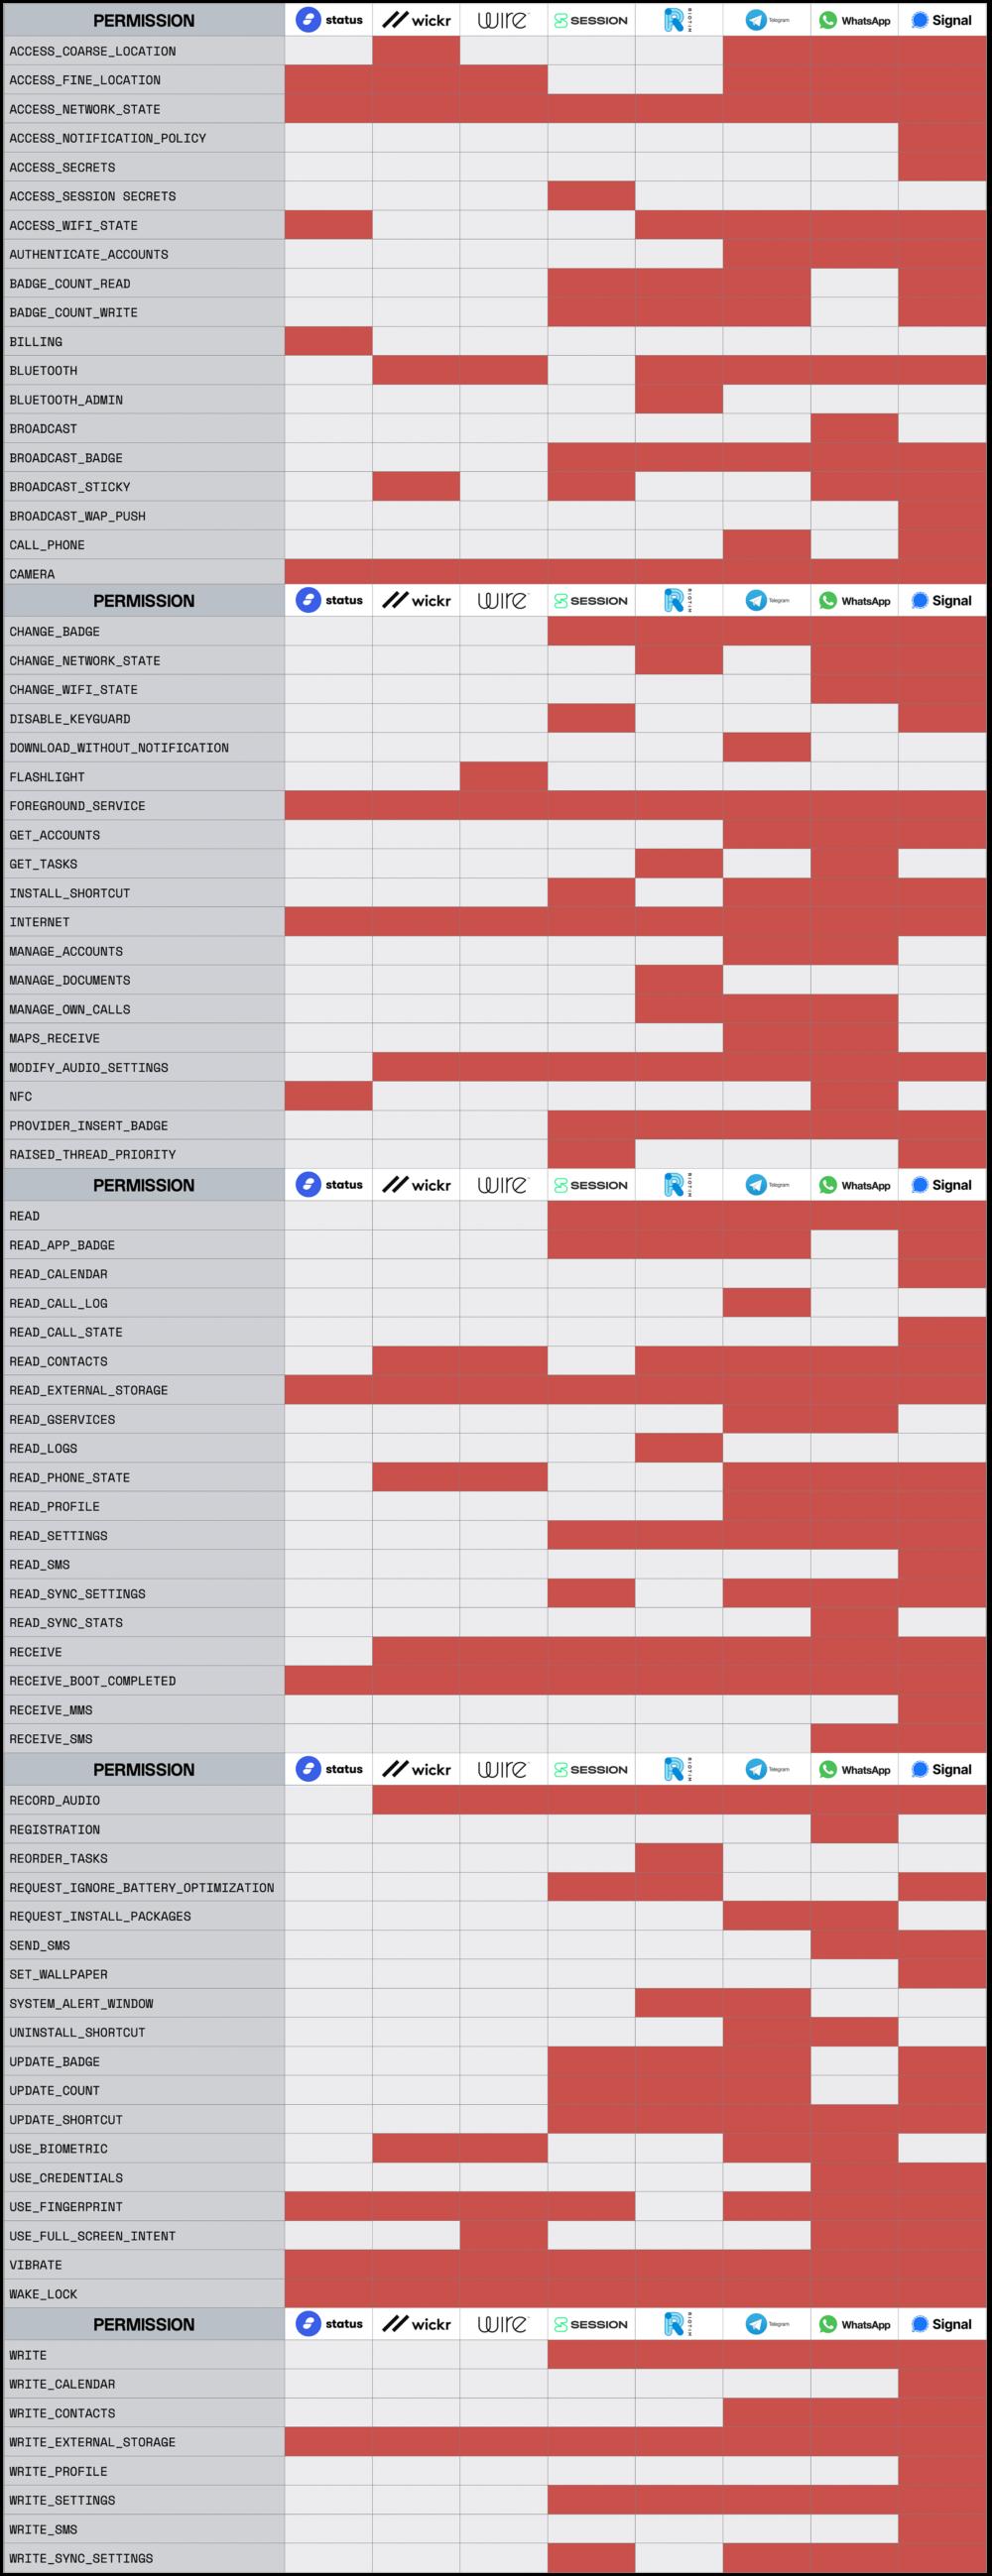 Session encrypted messenger permissions comparison